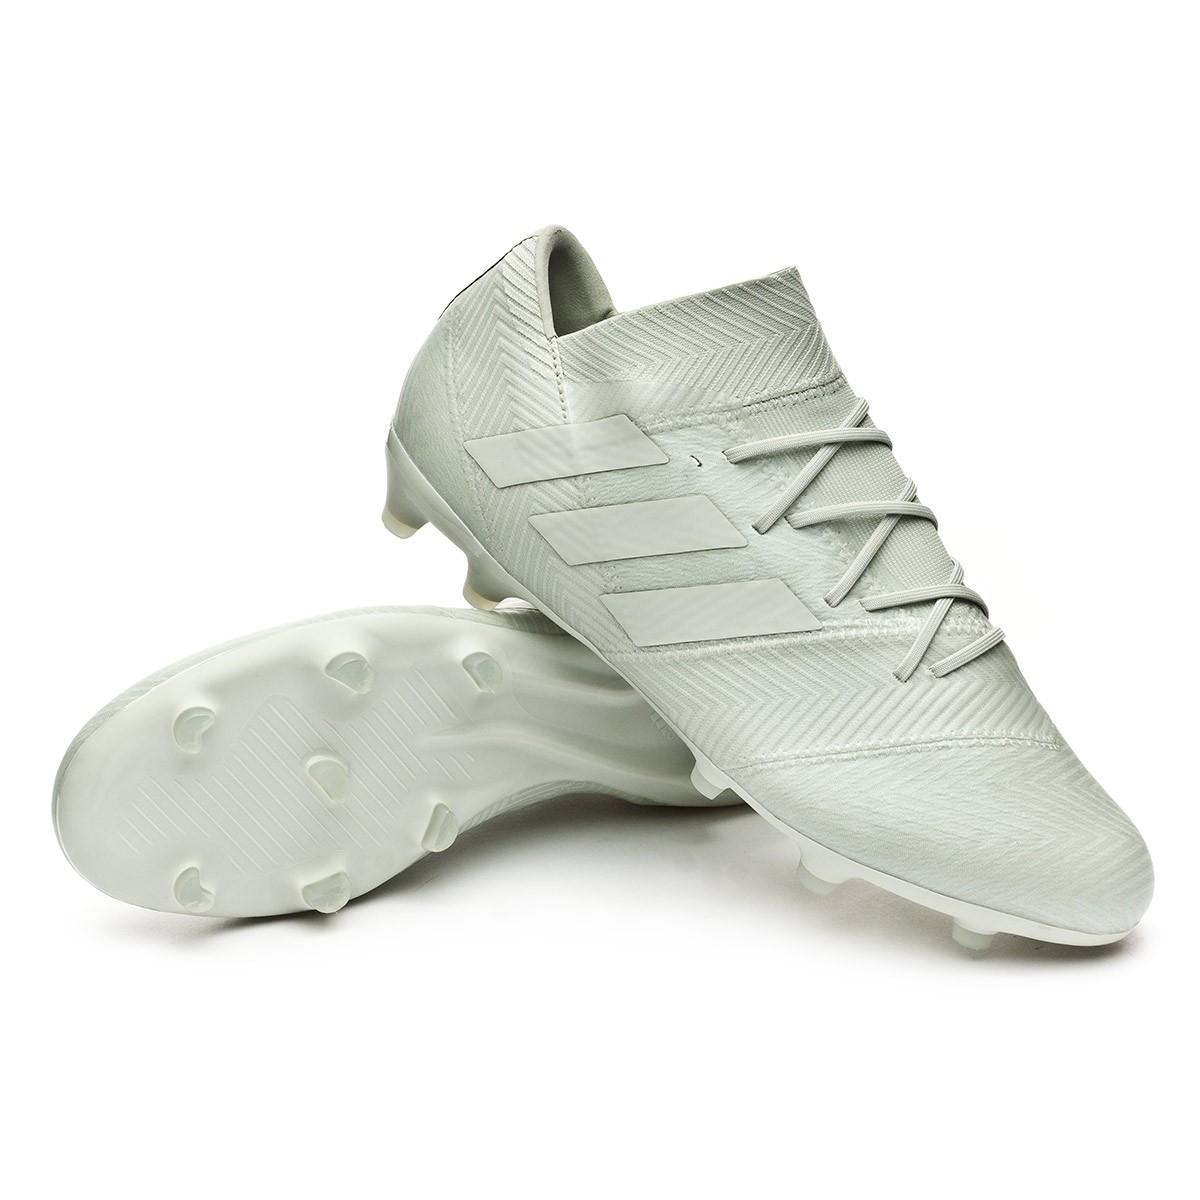 quality design 98dc3 186f2 adidas Nemeziz 18.2 FG Boot. Ash silver-White ...